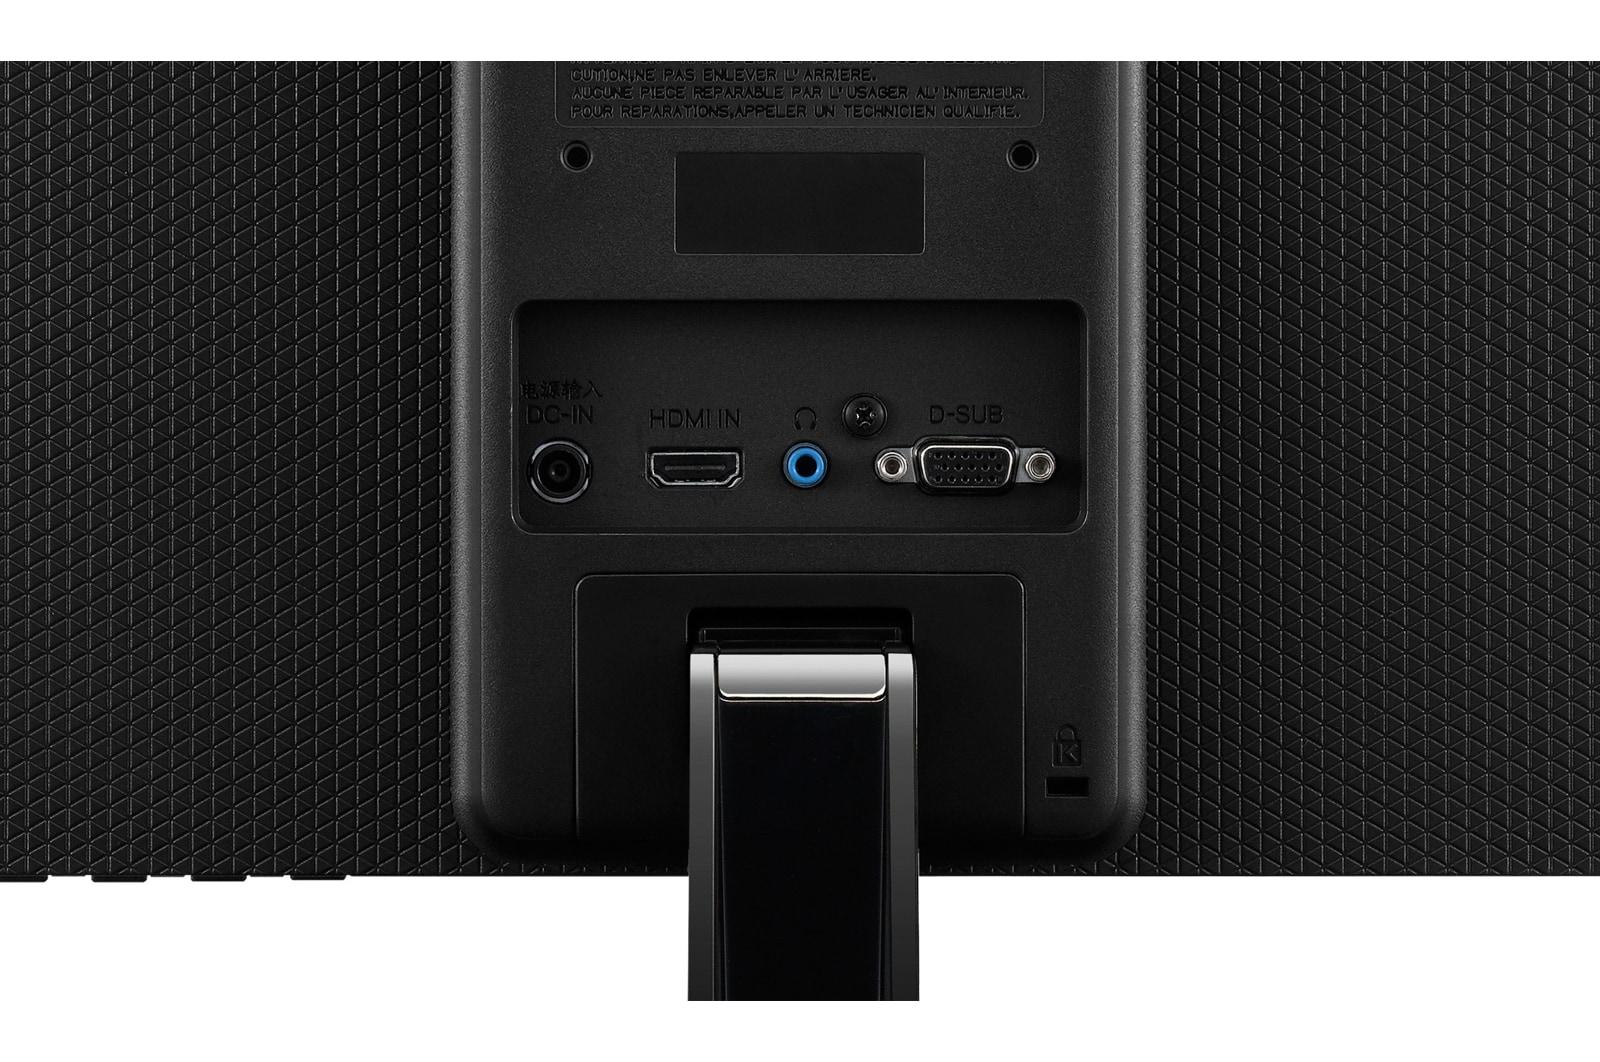 LG Monitores 22MP48HQ-P 8